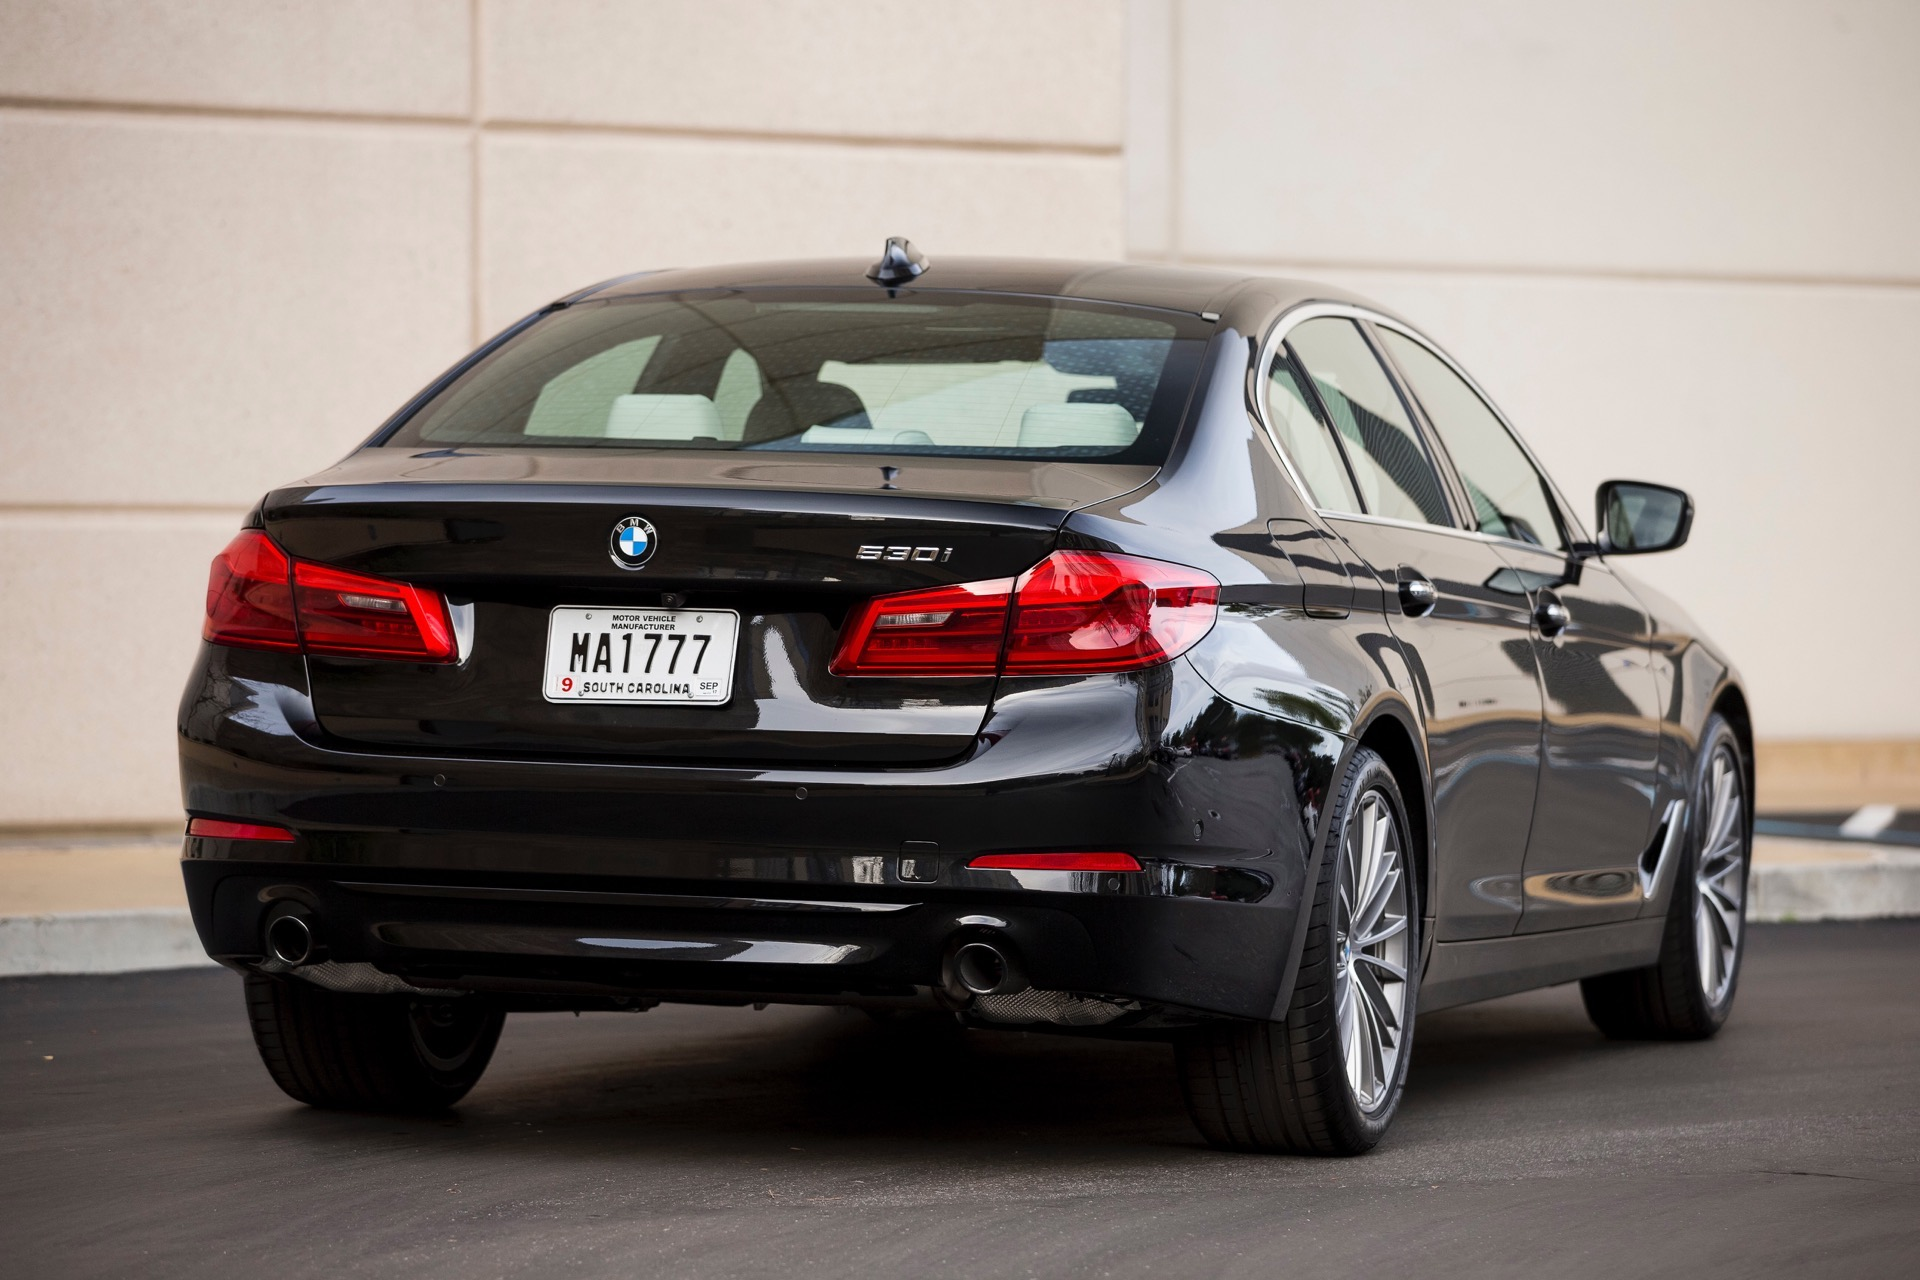 Mercedes Benz E 2017 Price >> FIRST DRIVE: 2017 BMW 530i M Sport